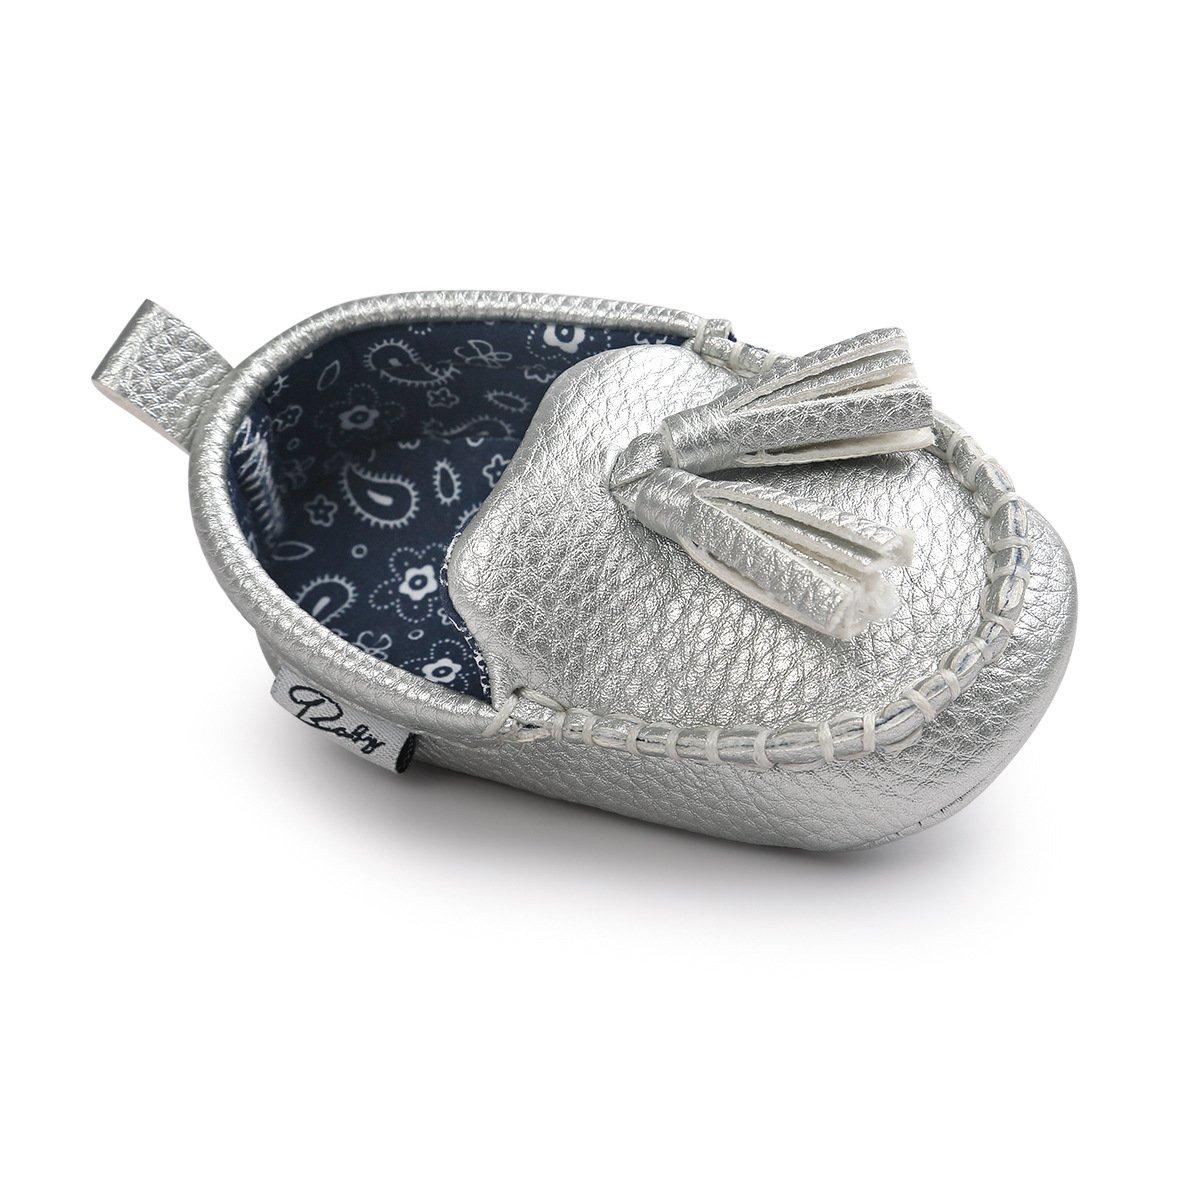 Meckior Newborn Infant Baby Girls Boys Tassels Soft Sole Penny Loafers Shoes Prewalker Moccasin